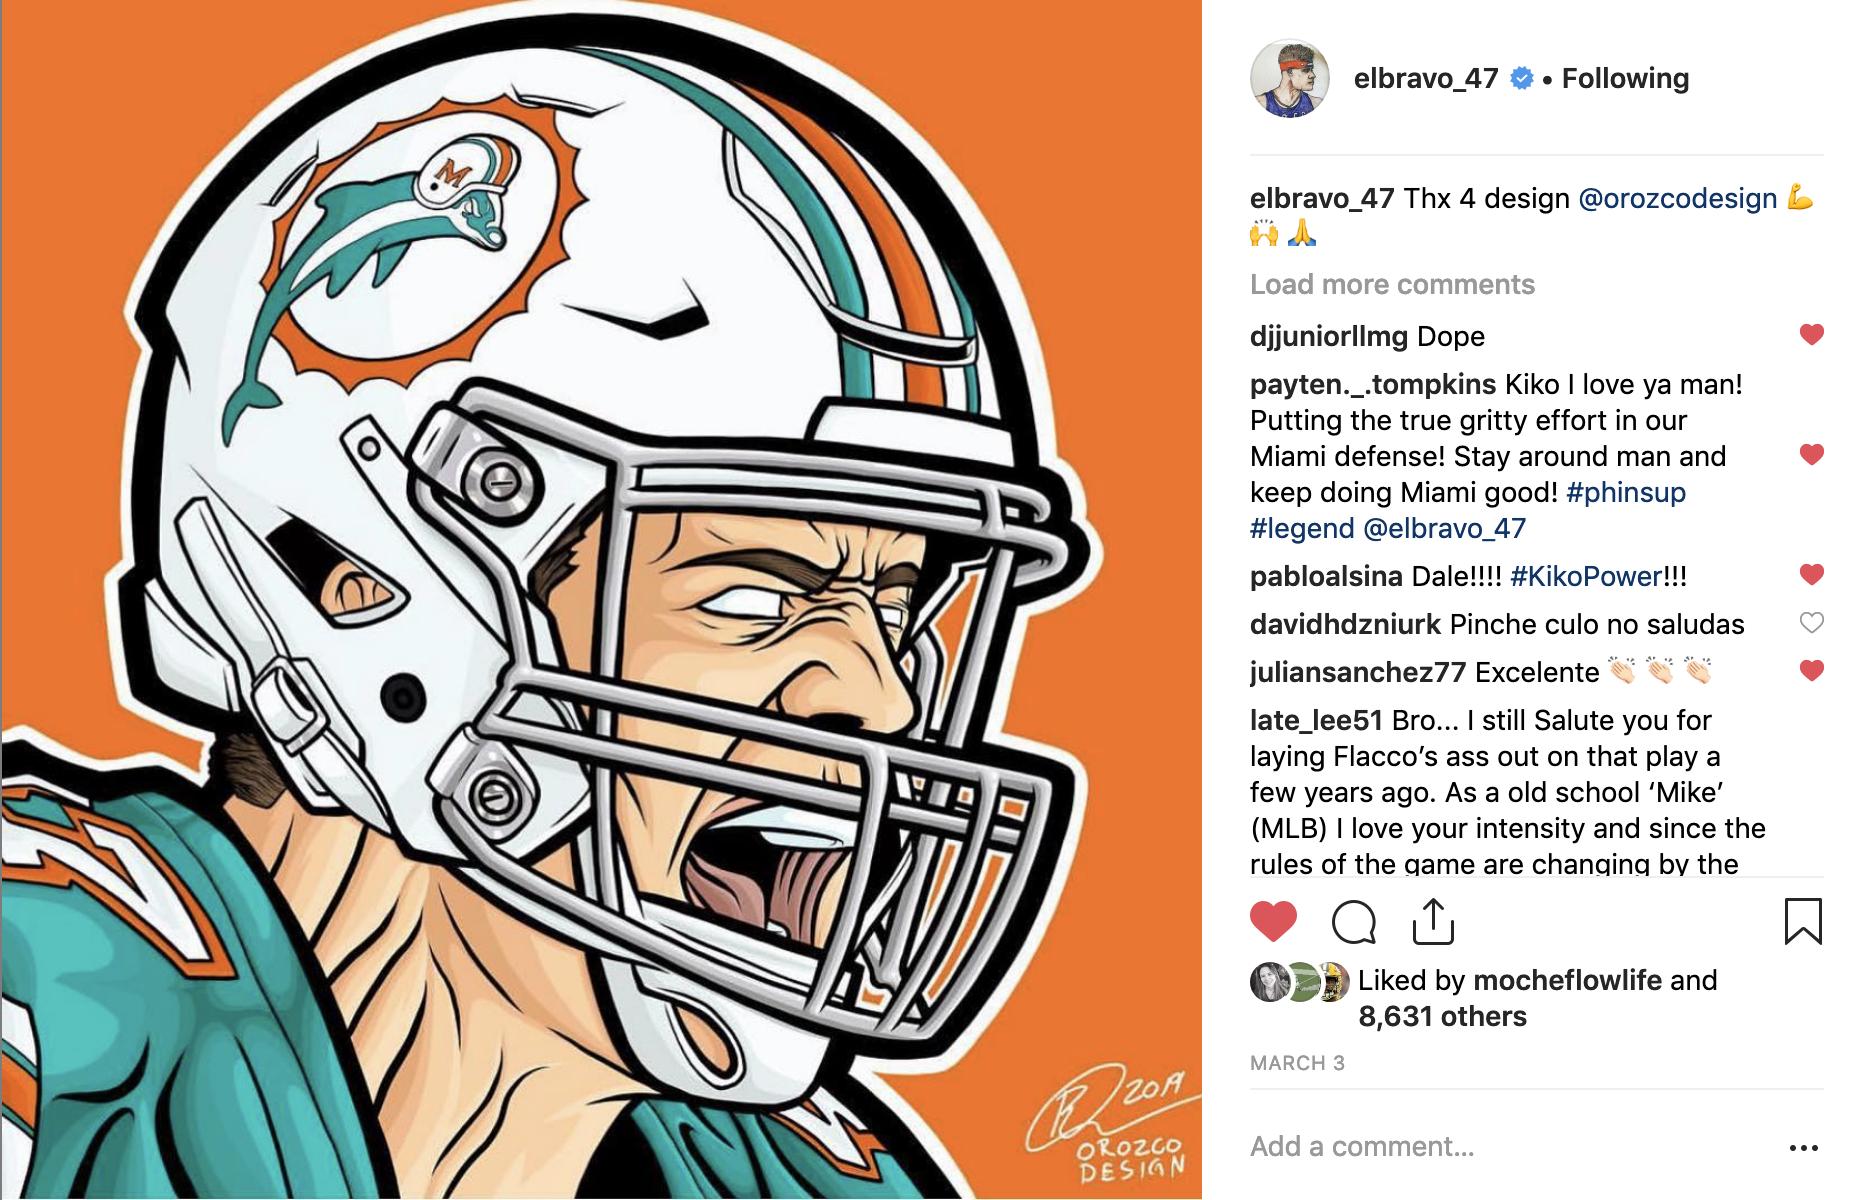 orozcodesign-miamidolphins-NFL-KikoAlonso-illustration-socialmedia.png